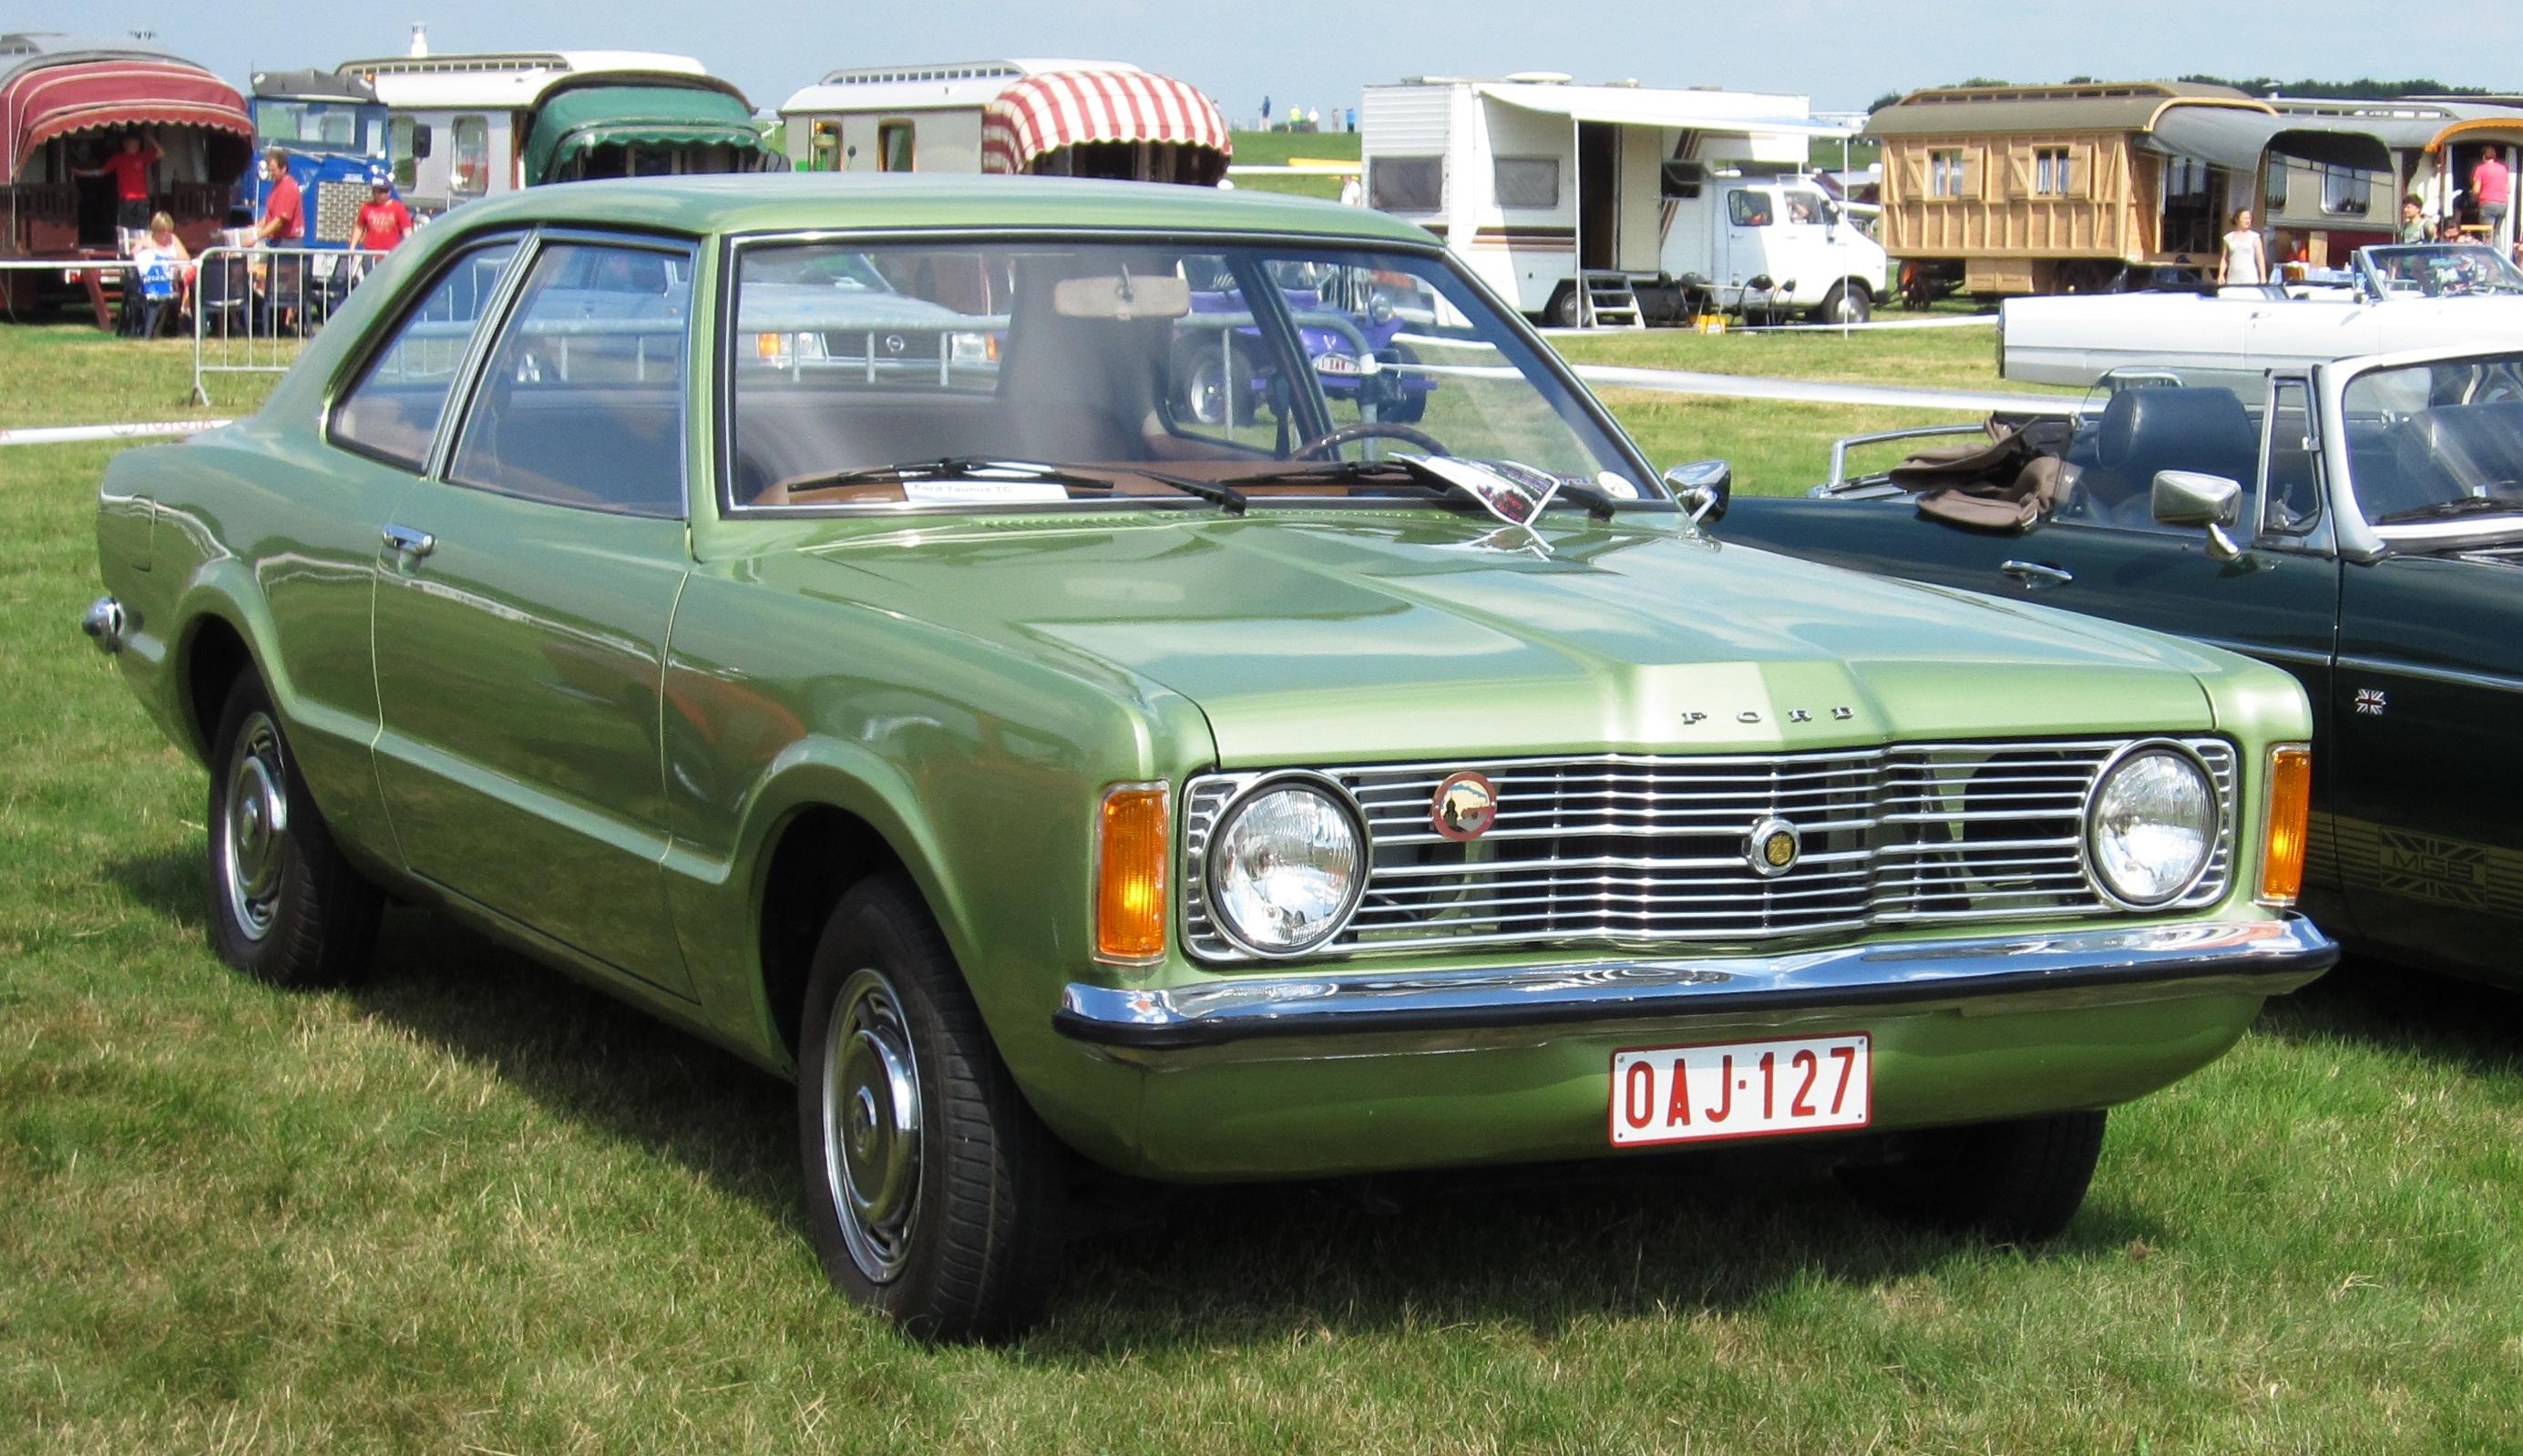 Ford Taunus I 1970 - 1976 Sedan #5